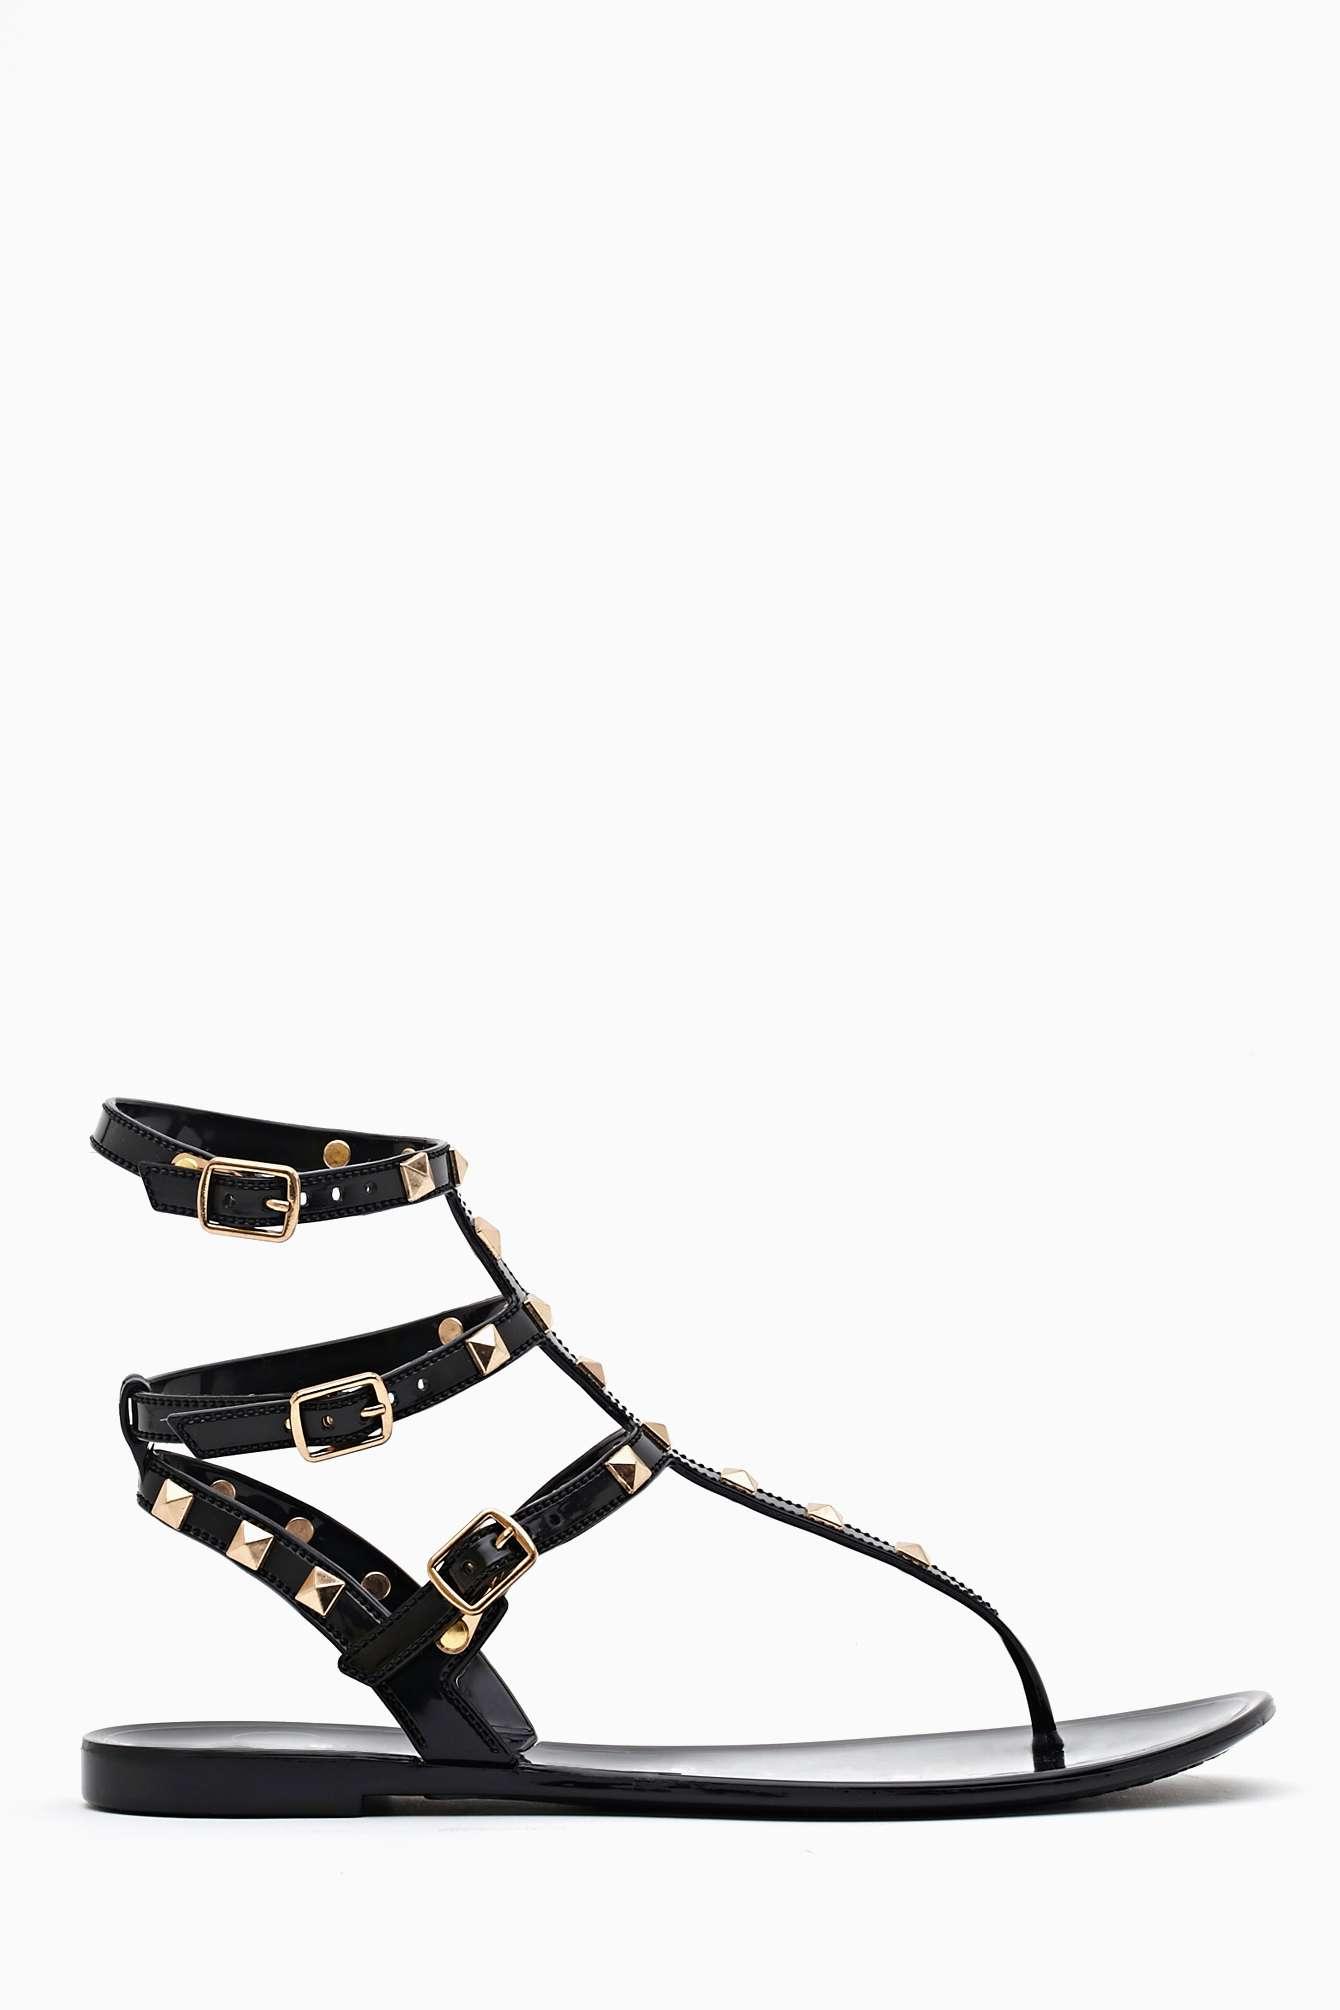 77e721d53b85 Lyst - Nasty Gal Leyla Studded Sandal Black in Black